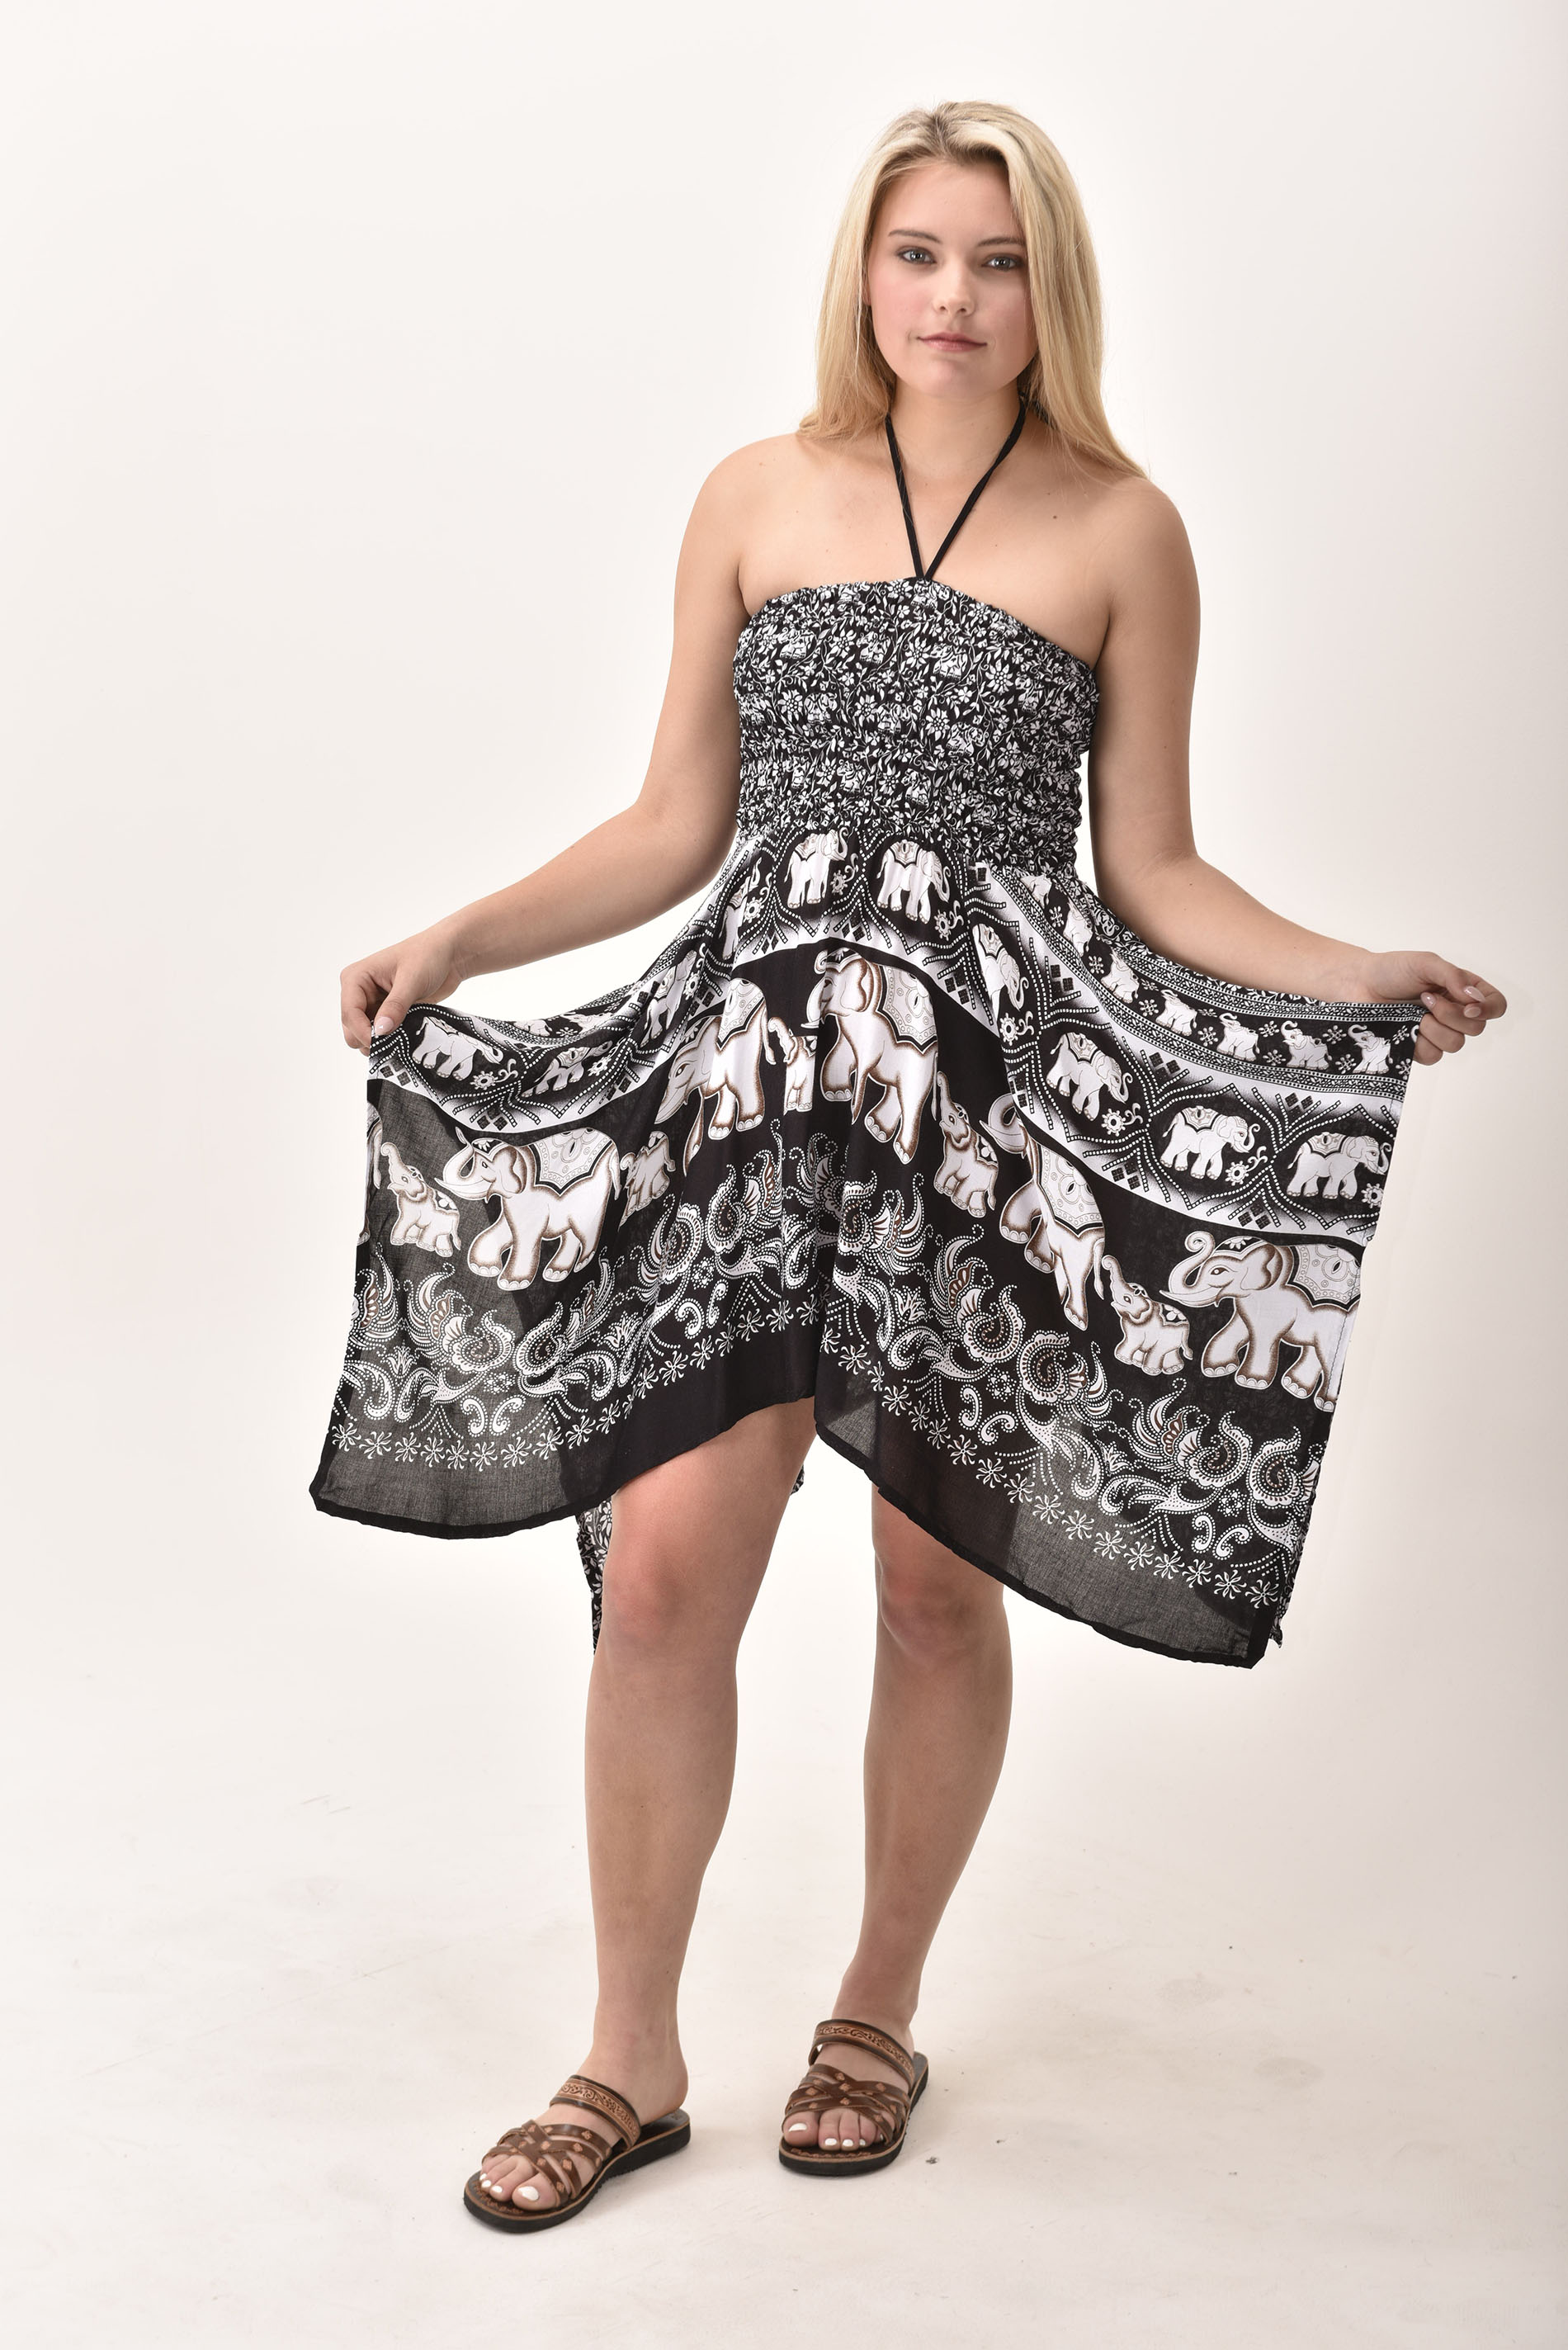 Elephant Print Rayon Fairy Dress / Skirt Black